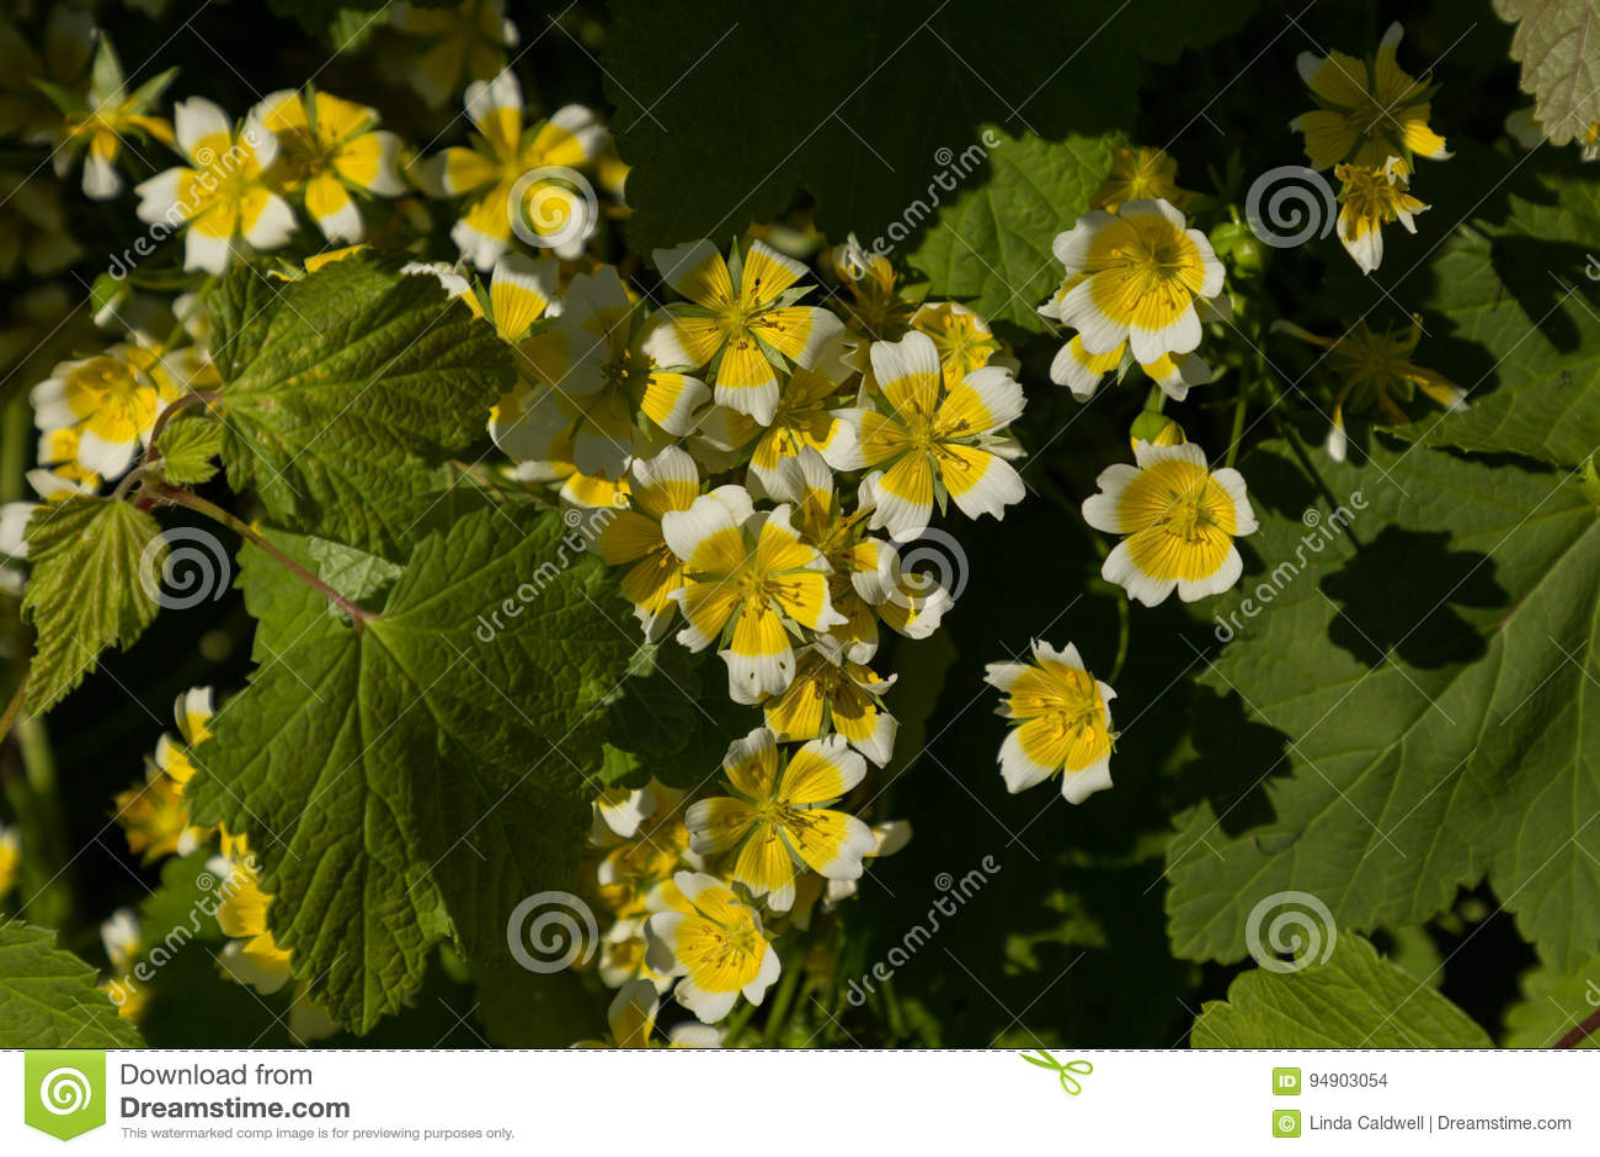 Yellow flowers stock photo image of blossoms portumna 94903054 yellow flowers mightylinksfo